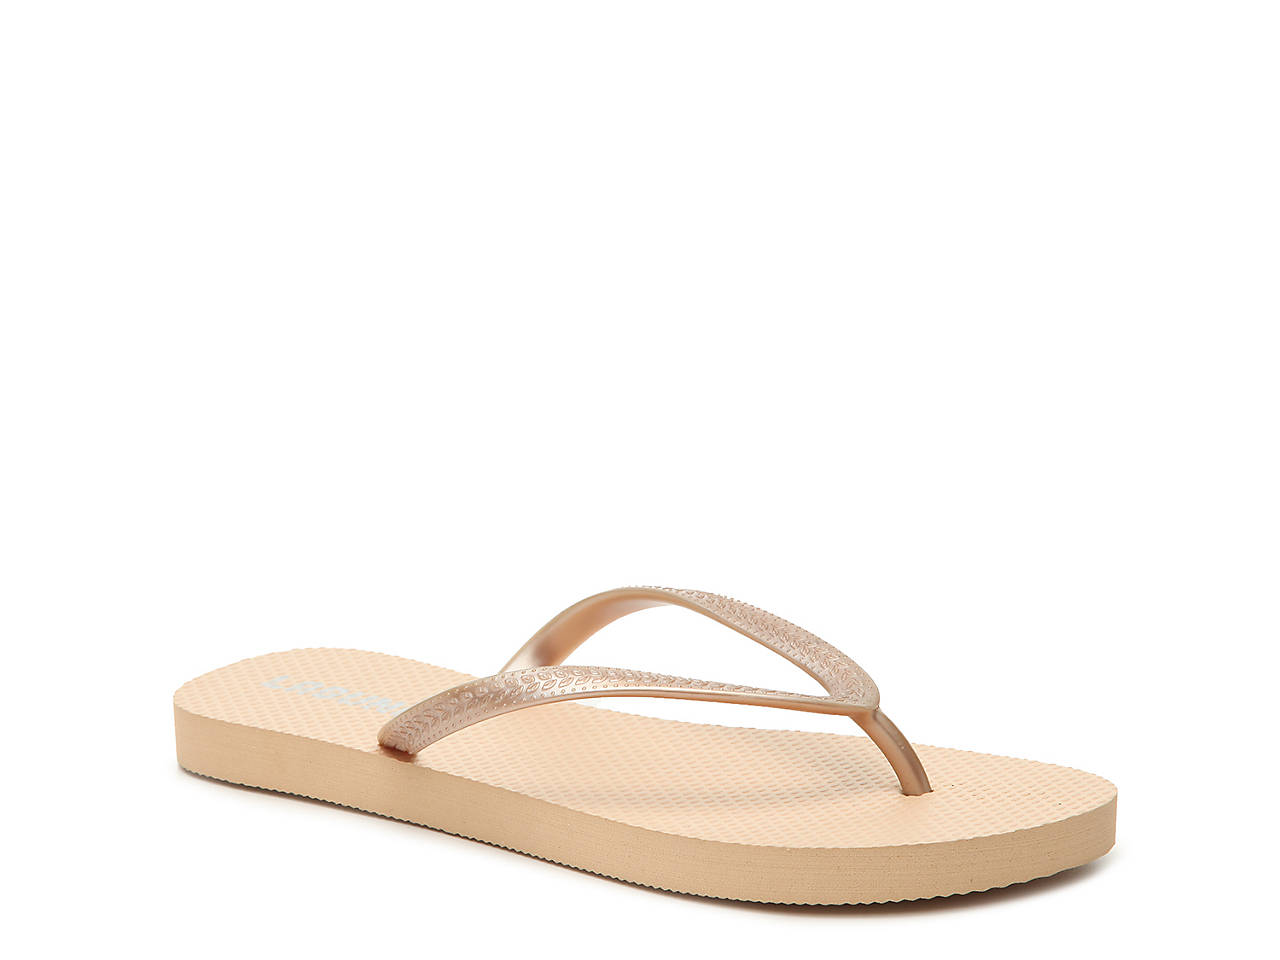 31f1d7ef1d90b Laguna Bali Flip Flop Women s Shoes